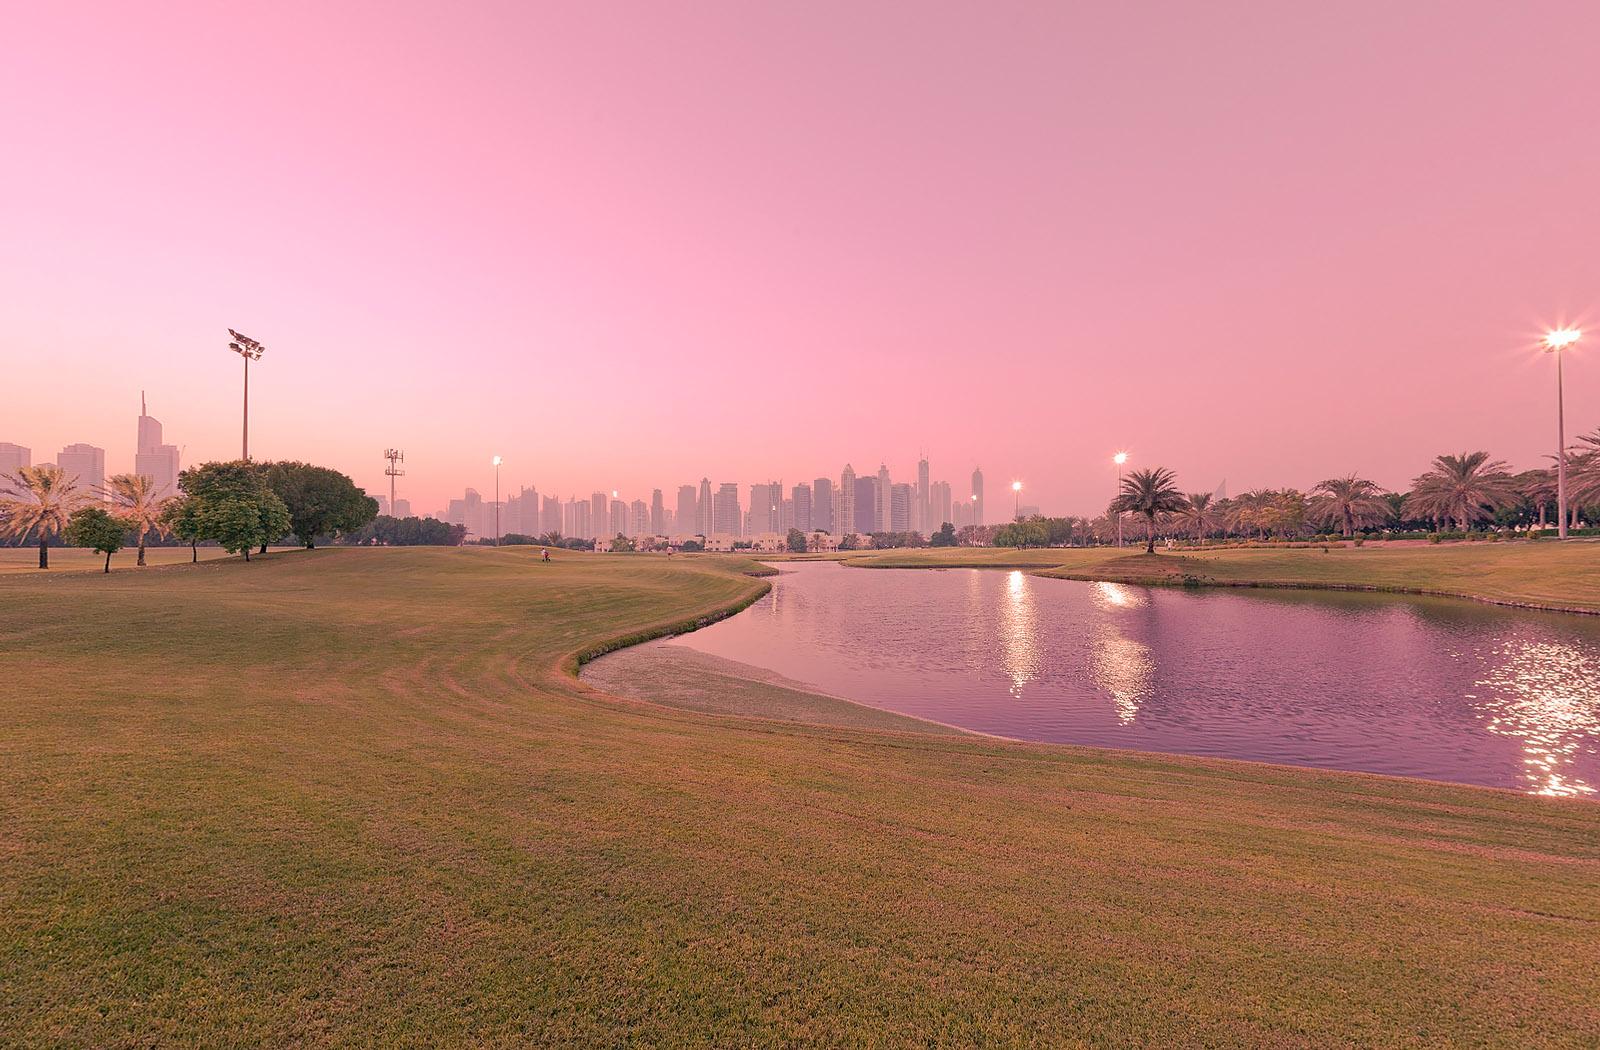 The Montgomerie Dubai Golf Club